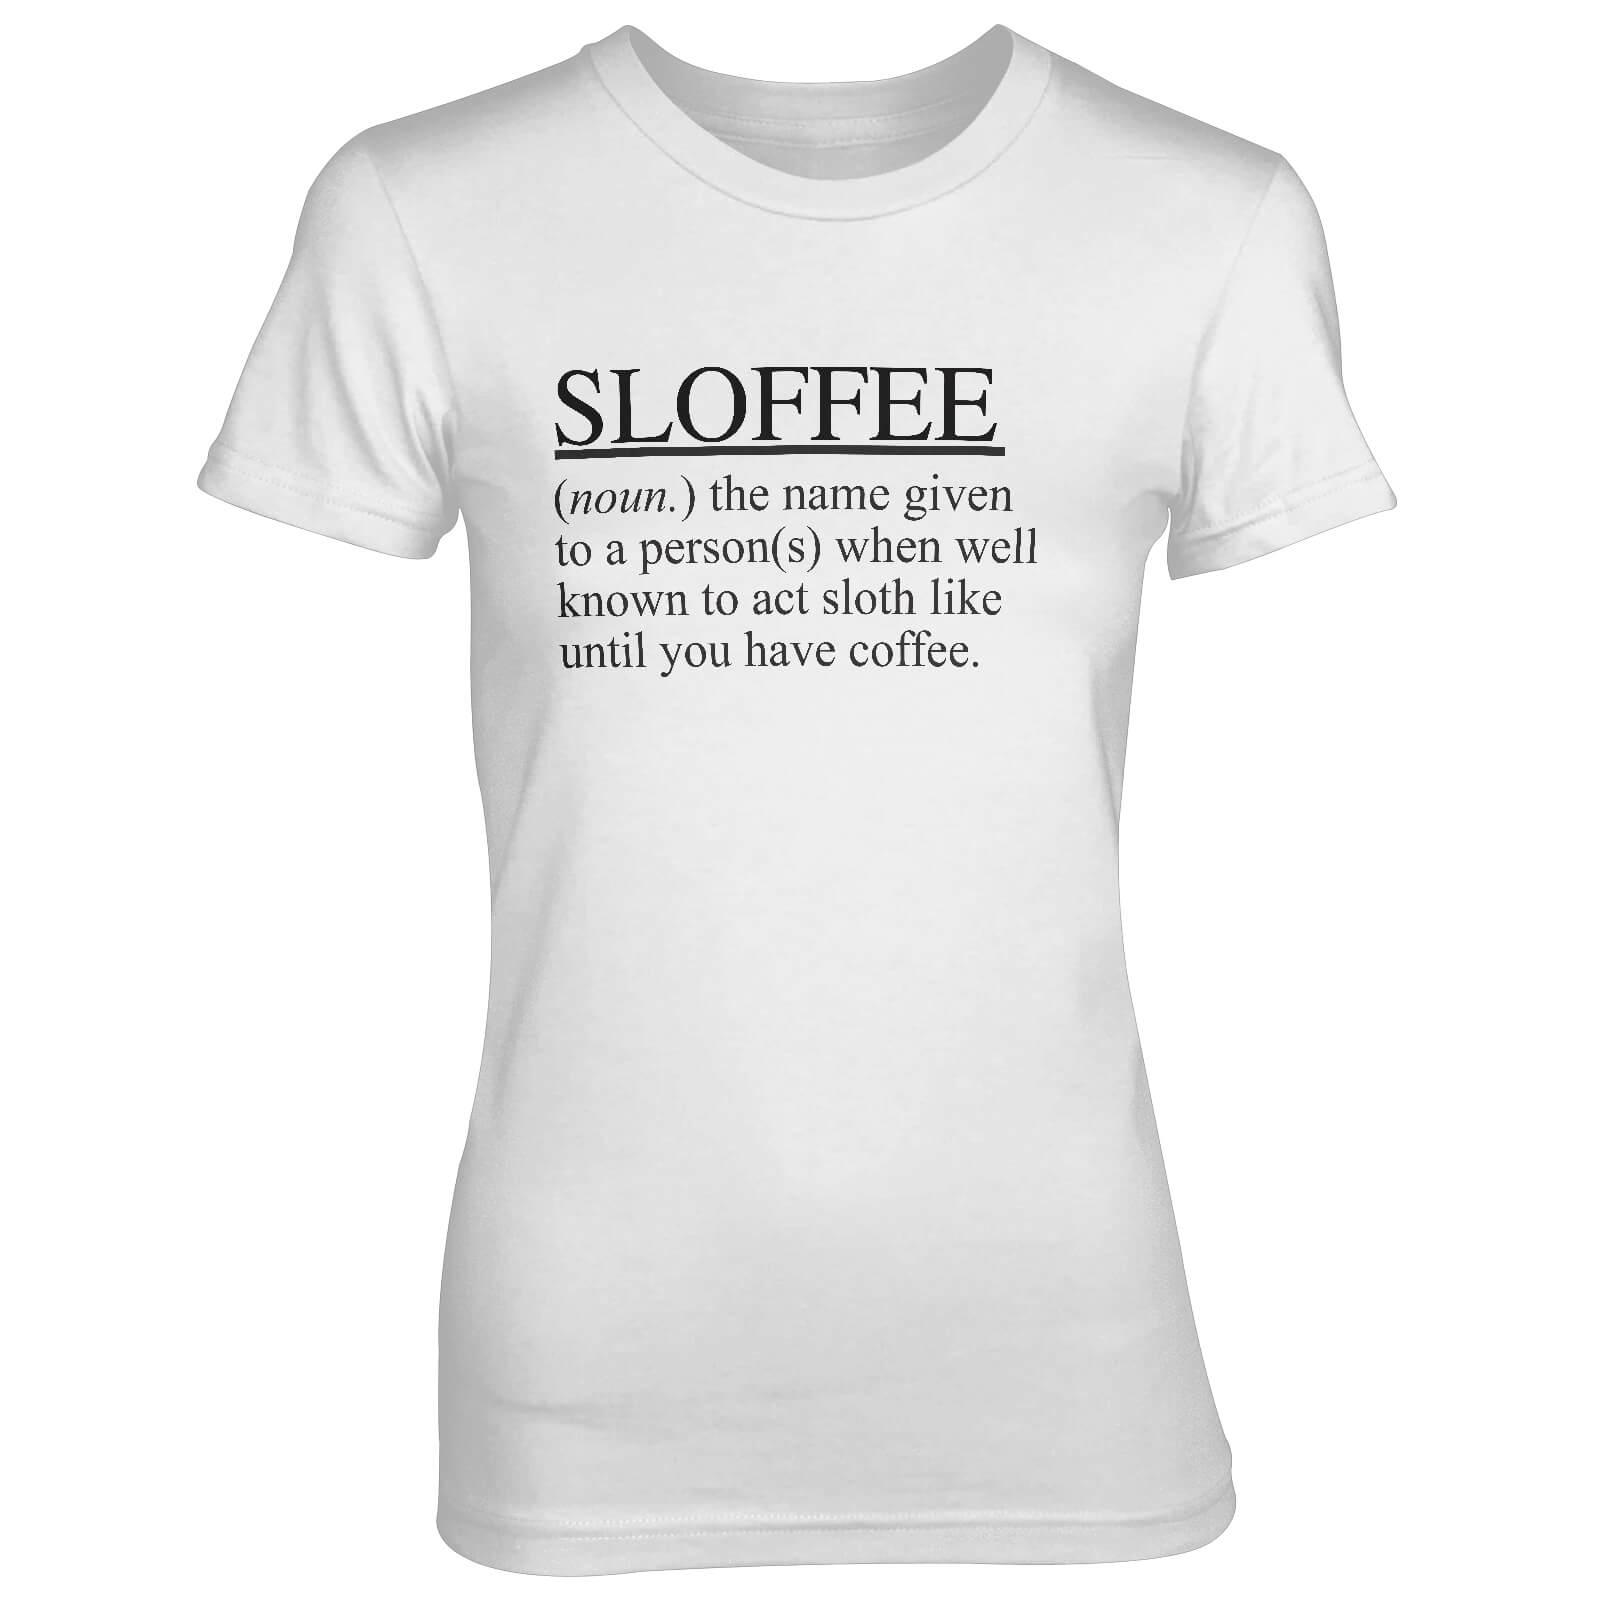 T-Junkie Sloffee Women's White T-Shirt - L - White